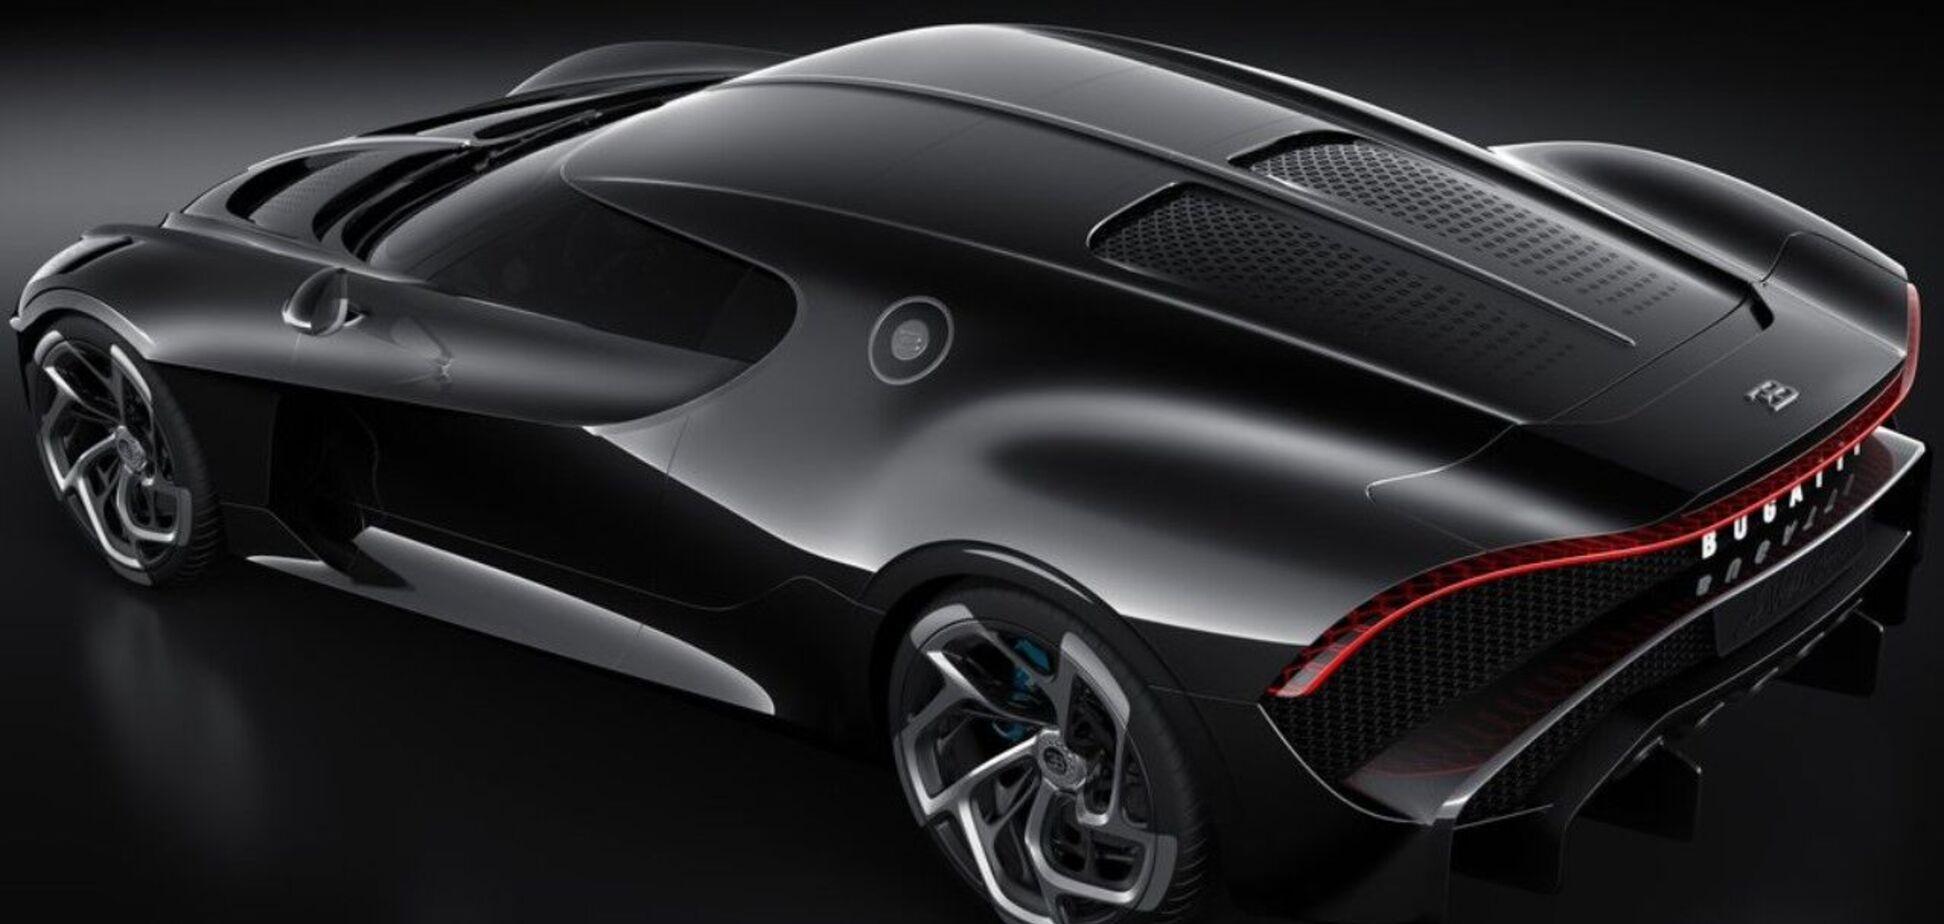 На данный момент рекордсменом является Bugatti La Voiture Noire. Фото: Bugatti